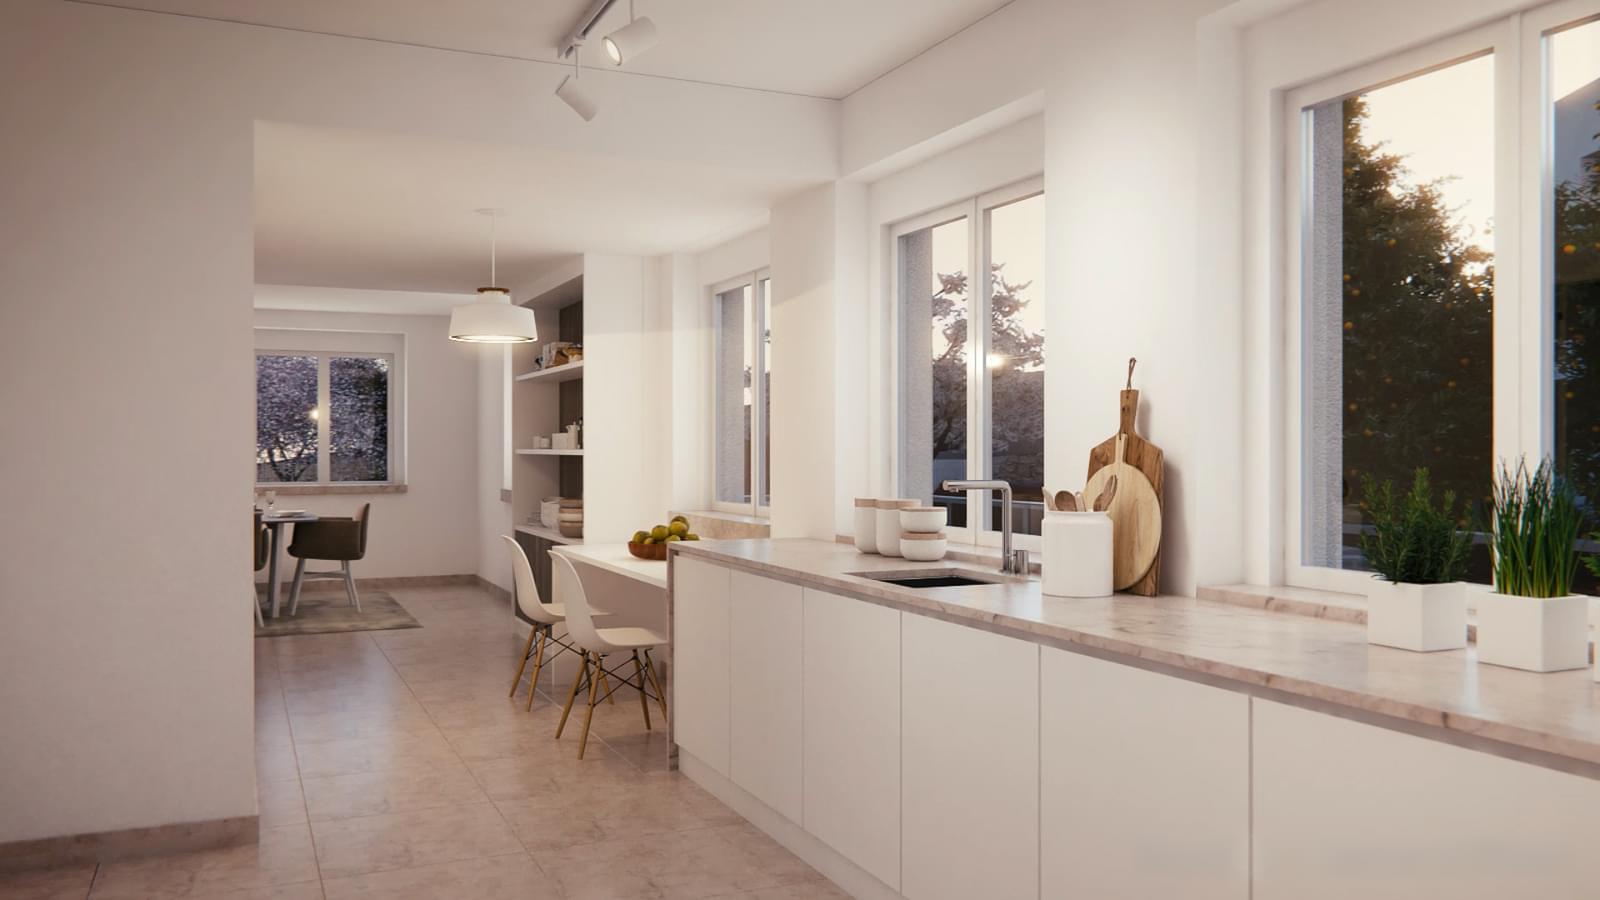 pf17059-apartamento-t2-1-cascais-e4d03e60-2229-48ba-b02a-1759429118e5